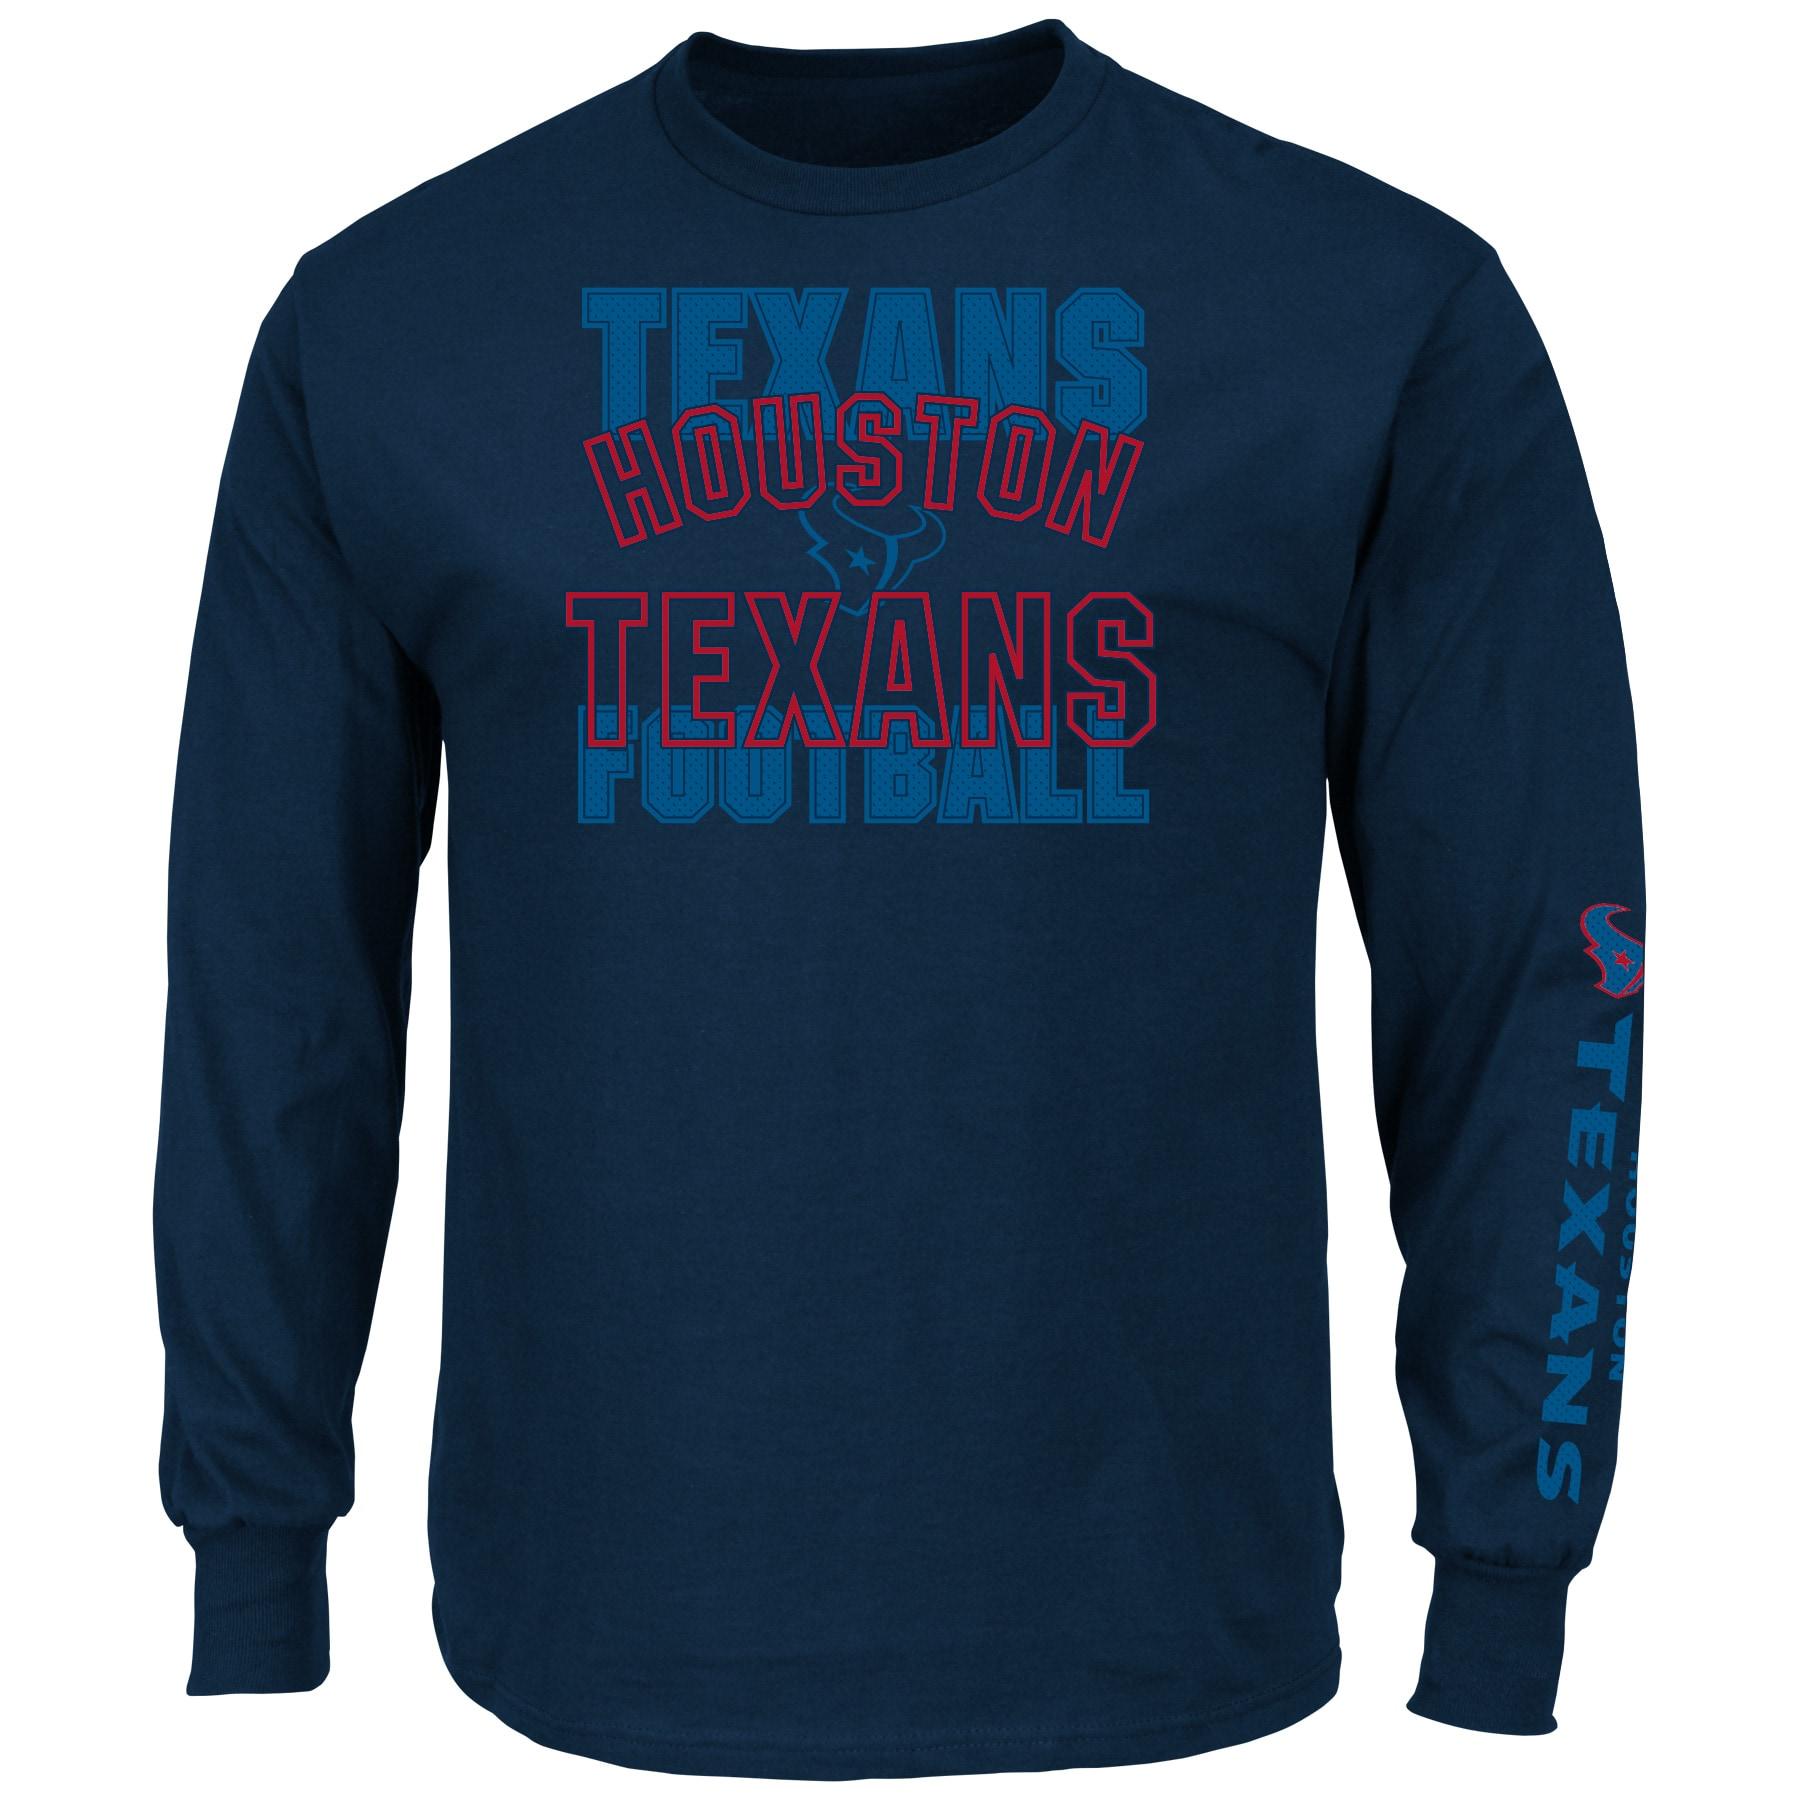 Houston Texans Majestic Primary Receiver Slogan Long Sleeve T-Shirt - Navy